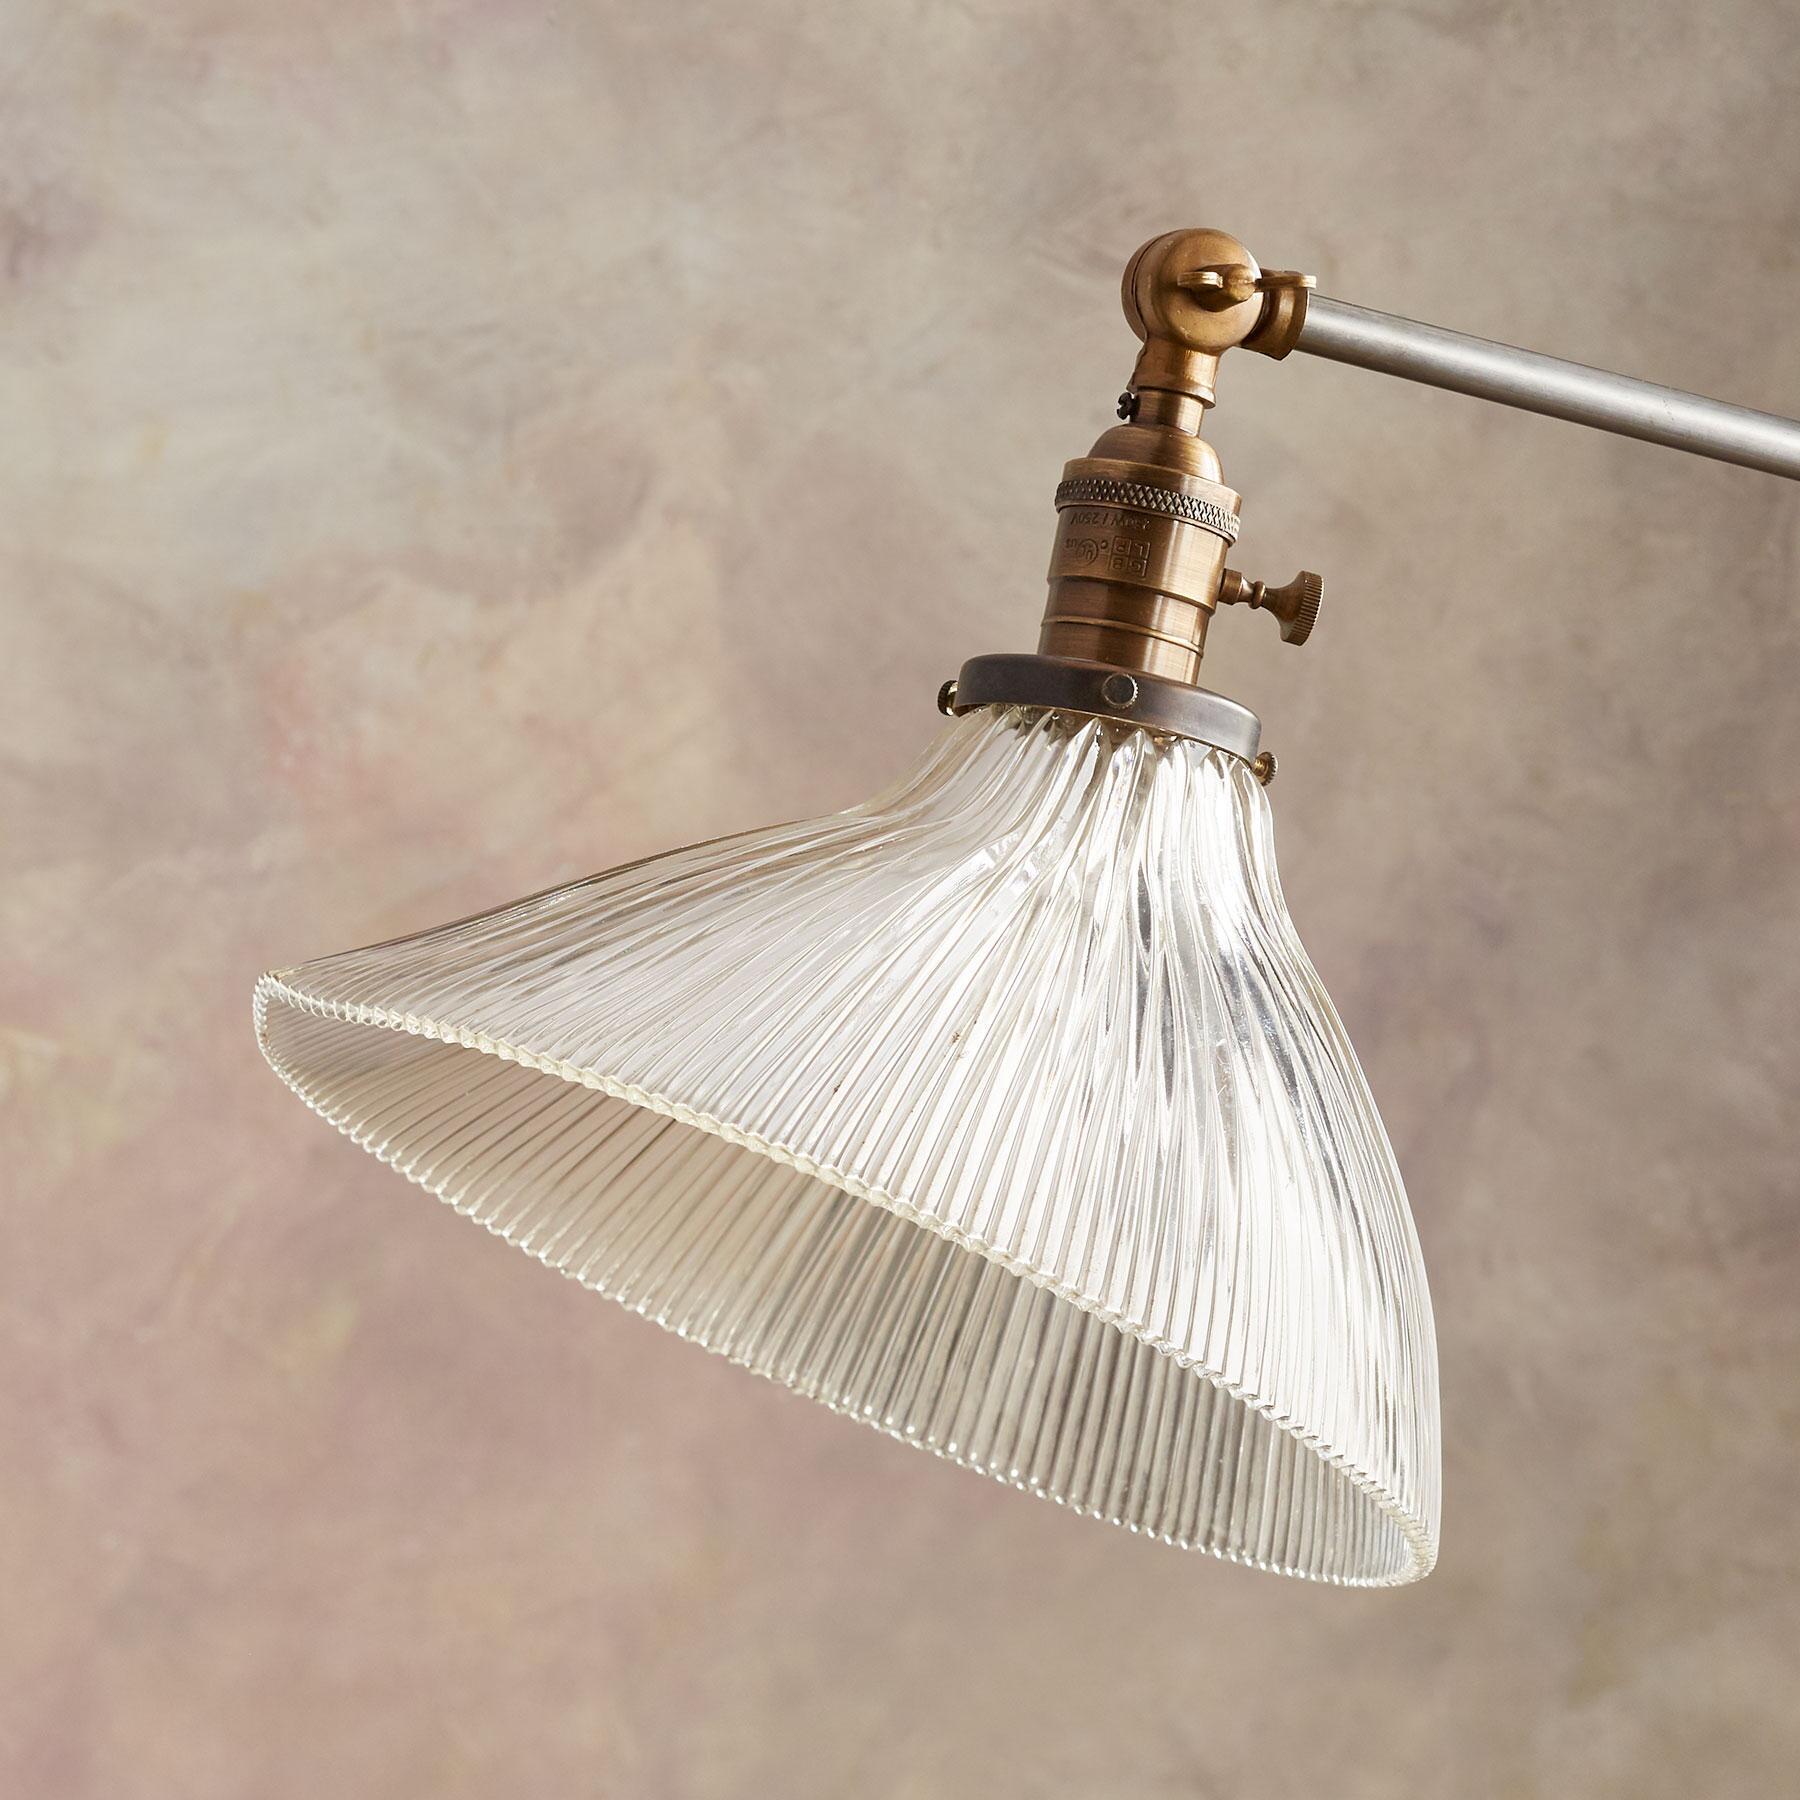 FREMONT RIVER FLOOR LAMP: View 2